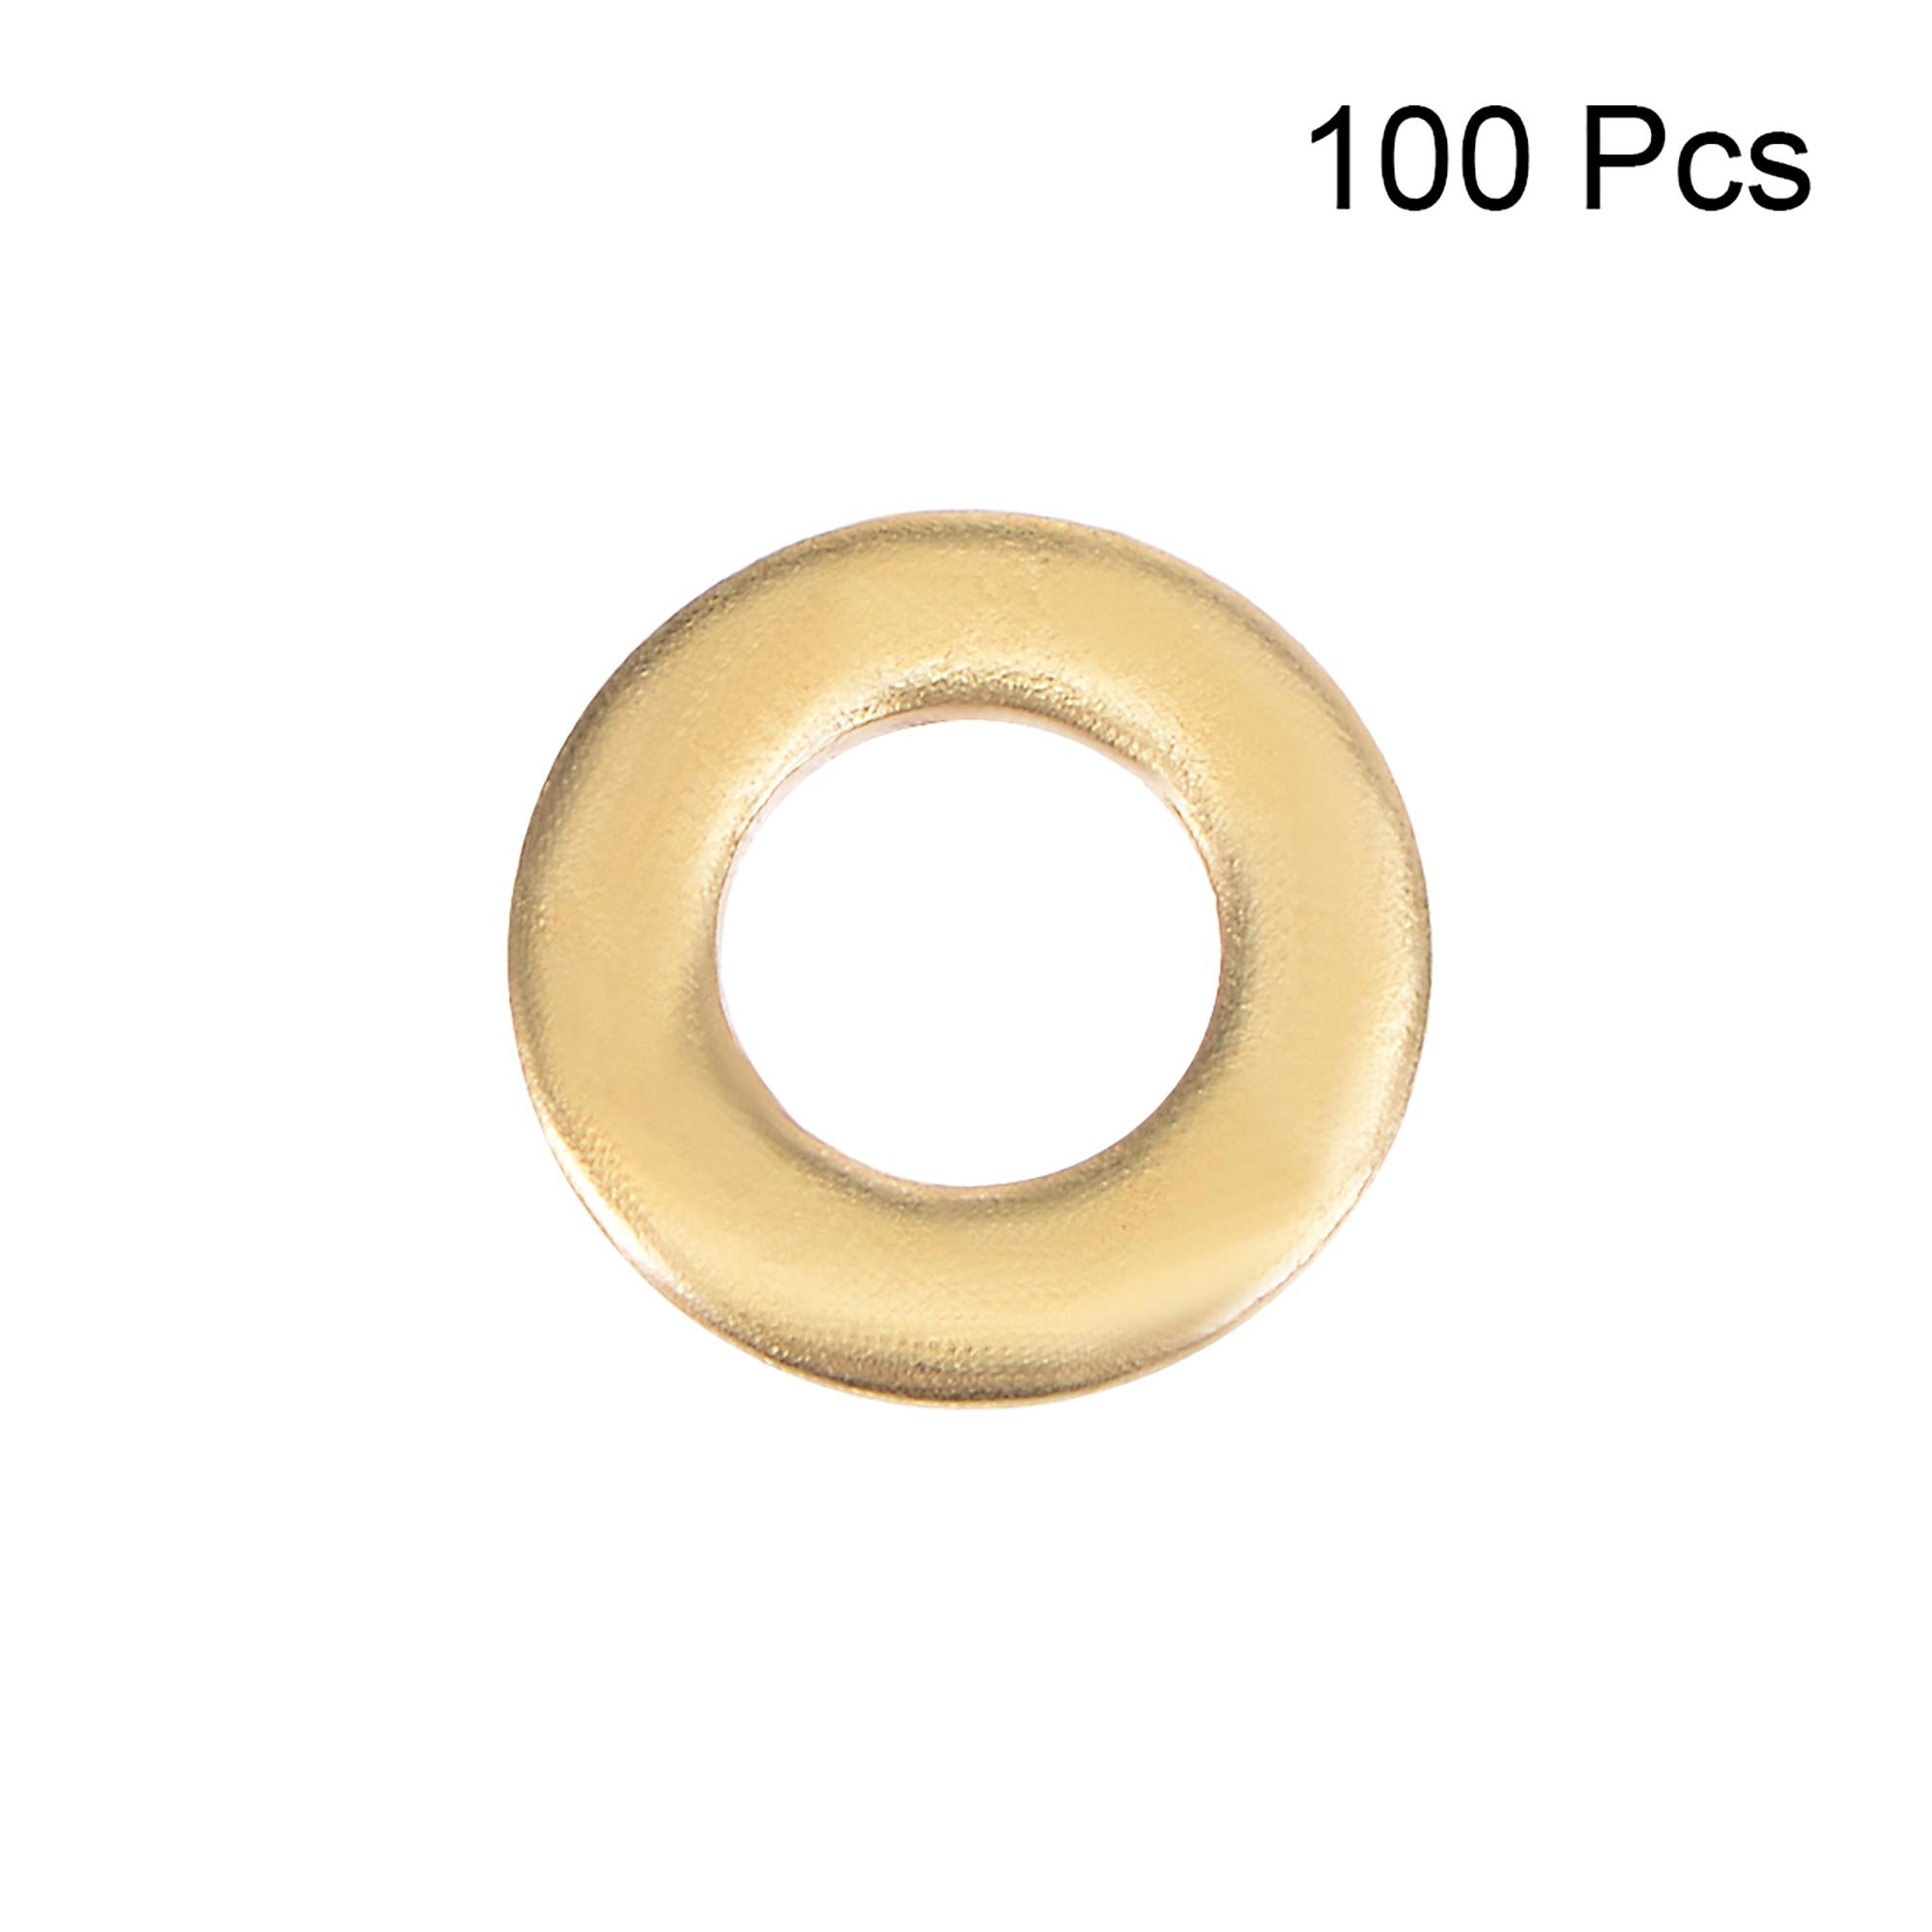 100Pcs 2.5mm x 5mm x 0.5mm Copper Flat Washer for Screw Bolt - image 1 de 3